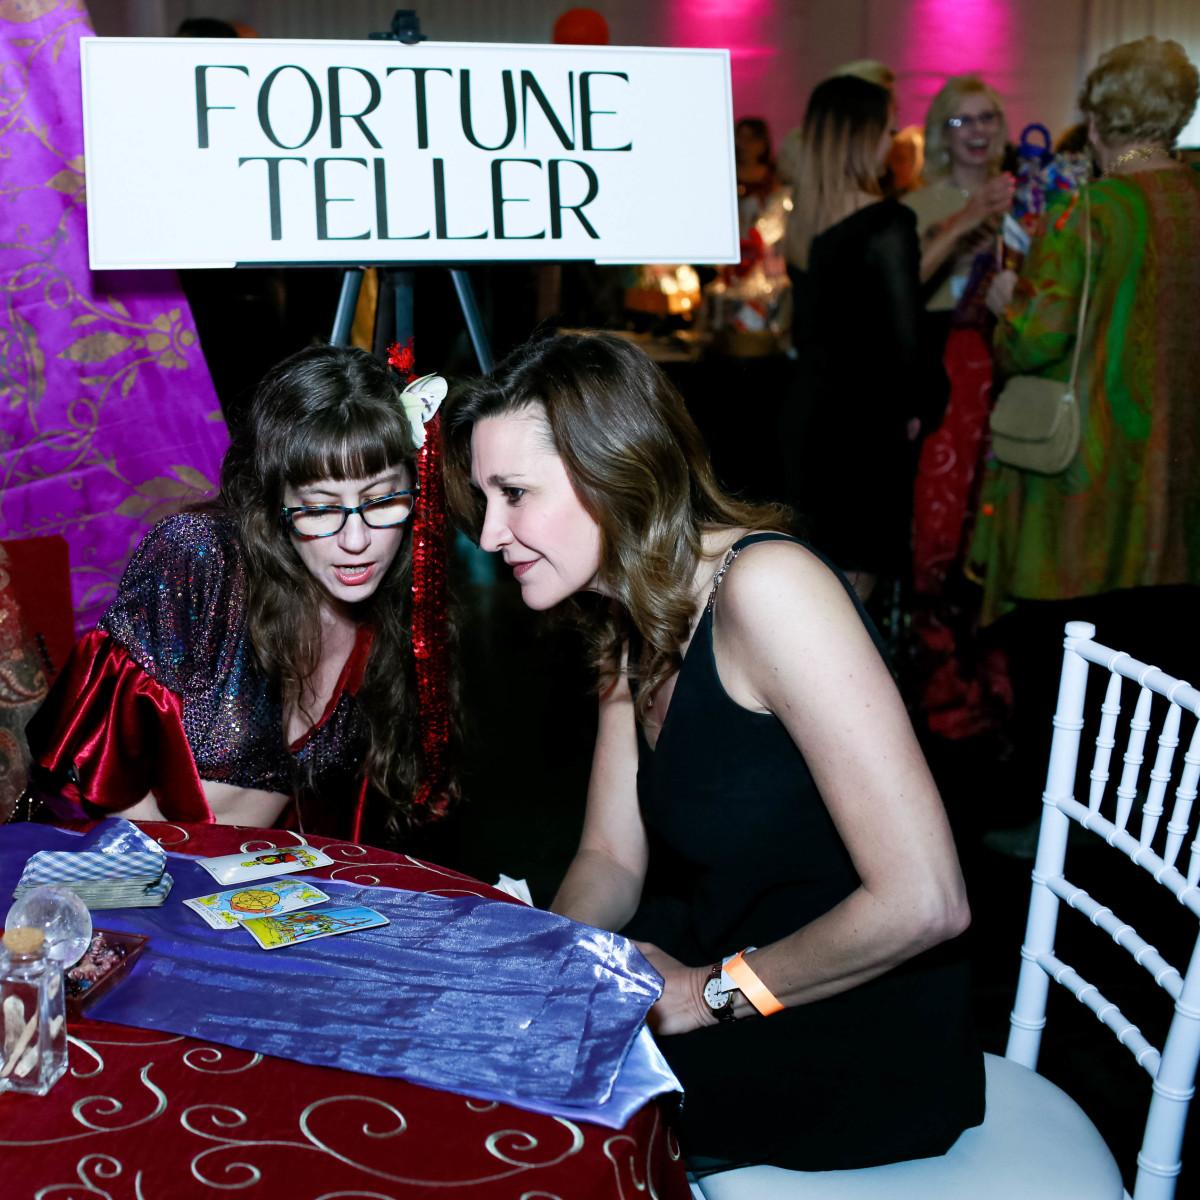 Tarot Fortune Teller Violette and Heather Davis